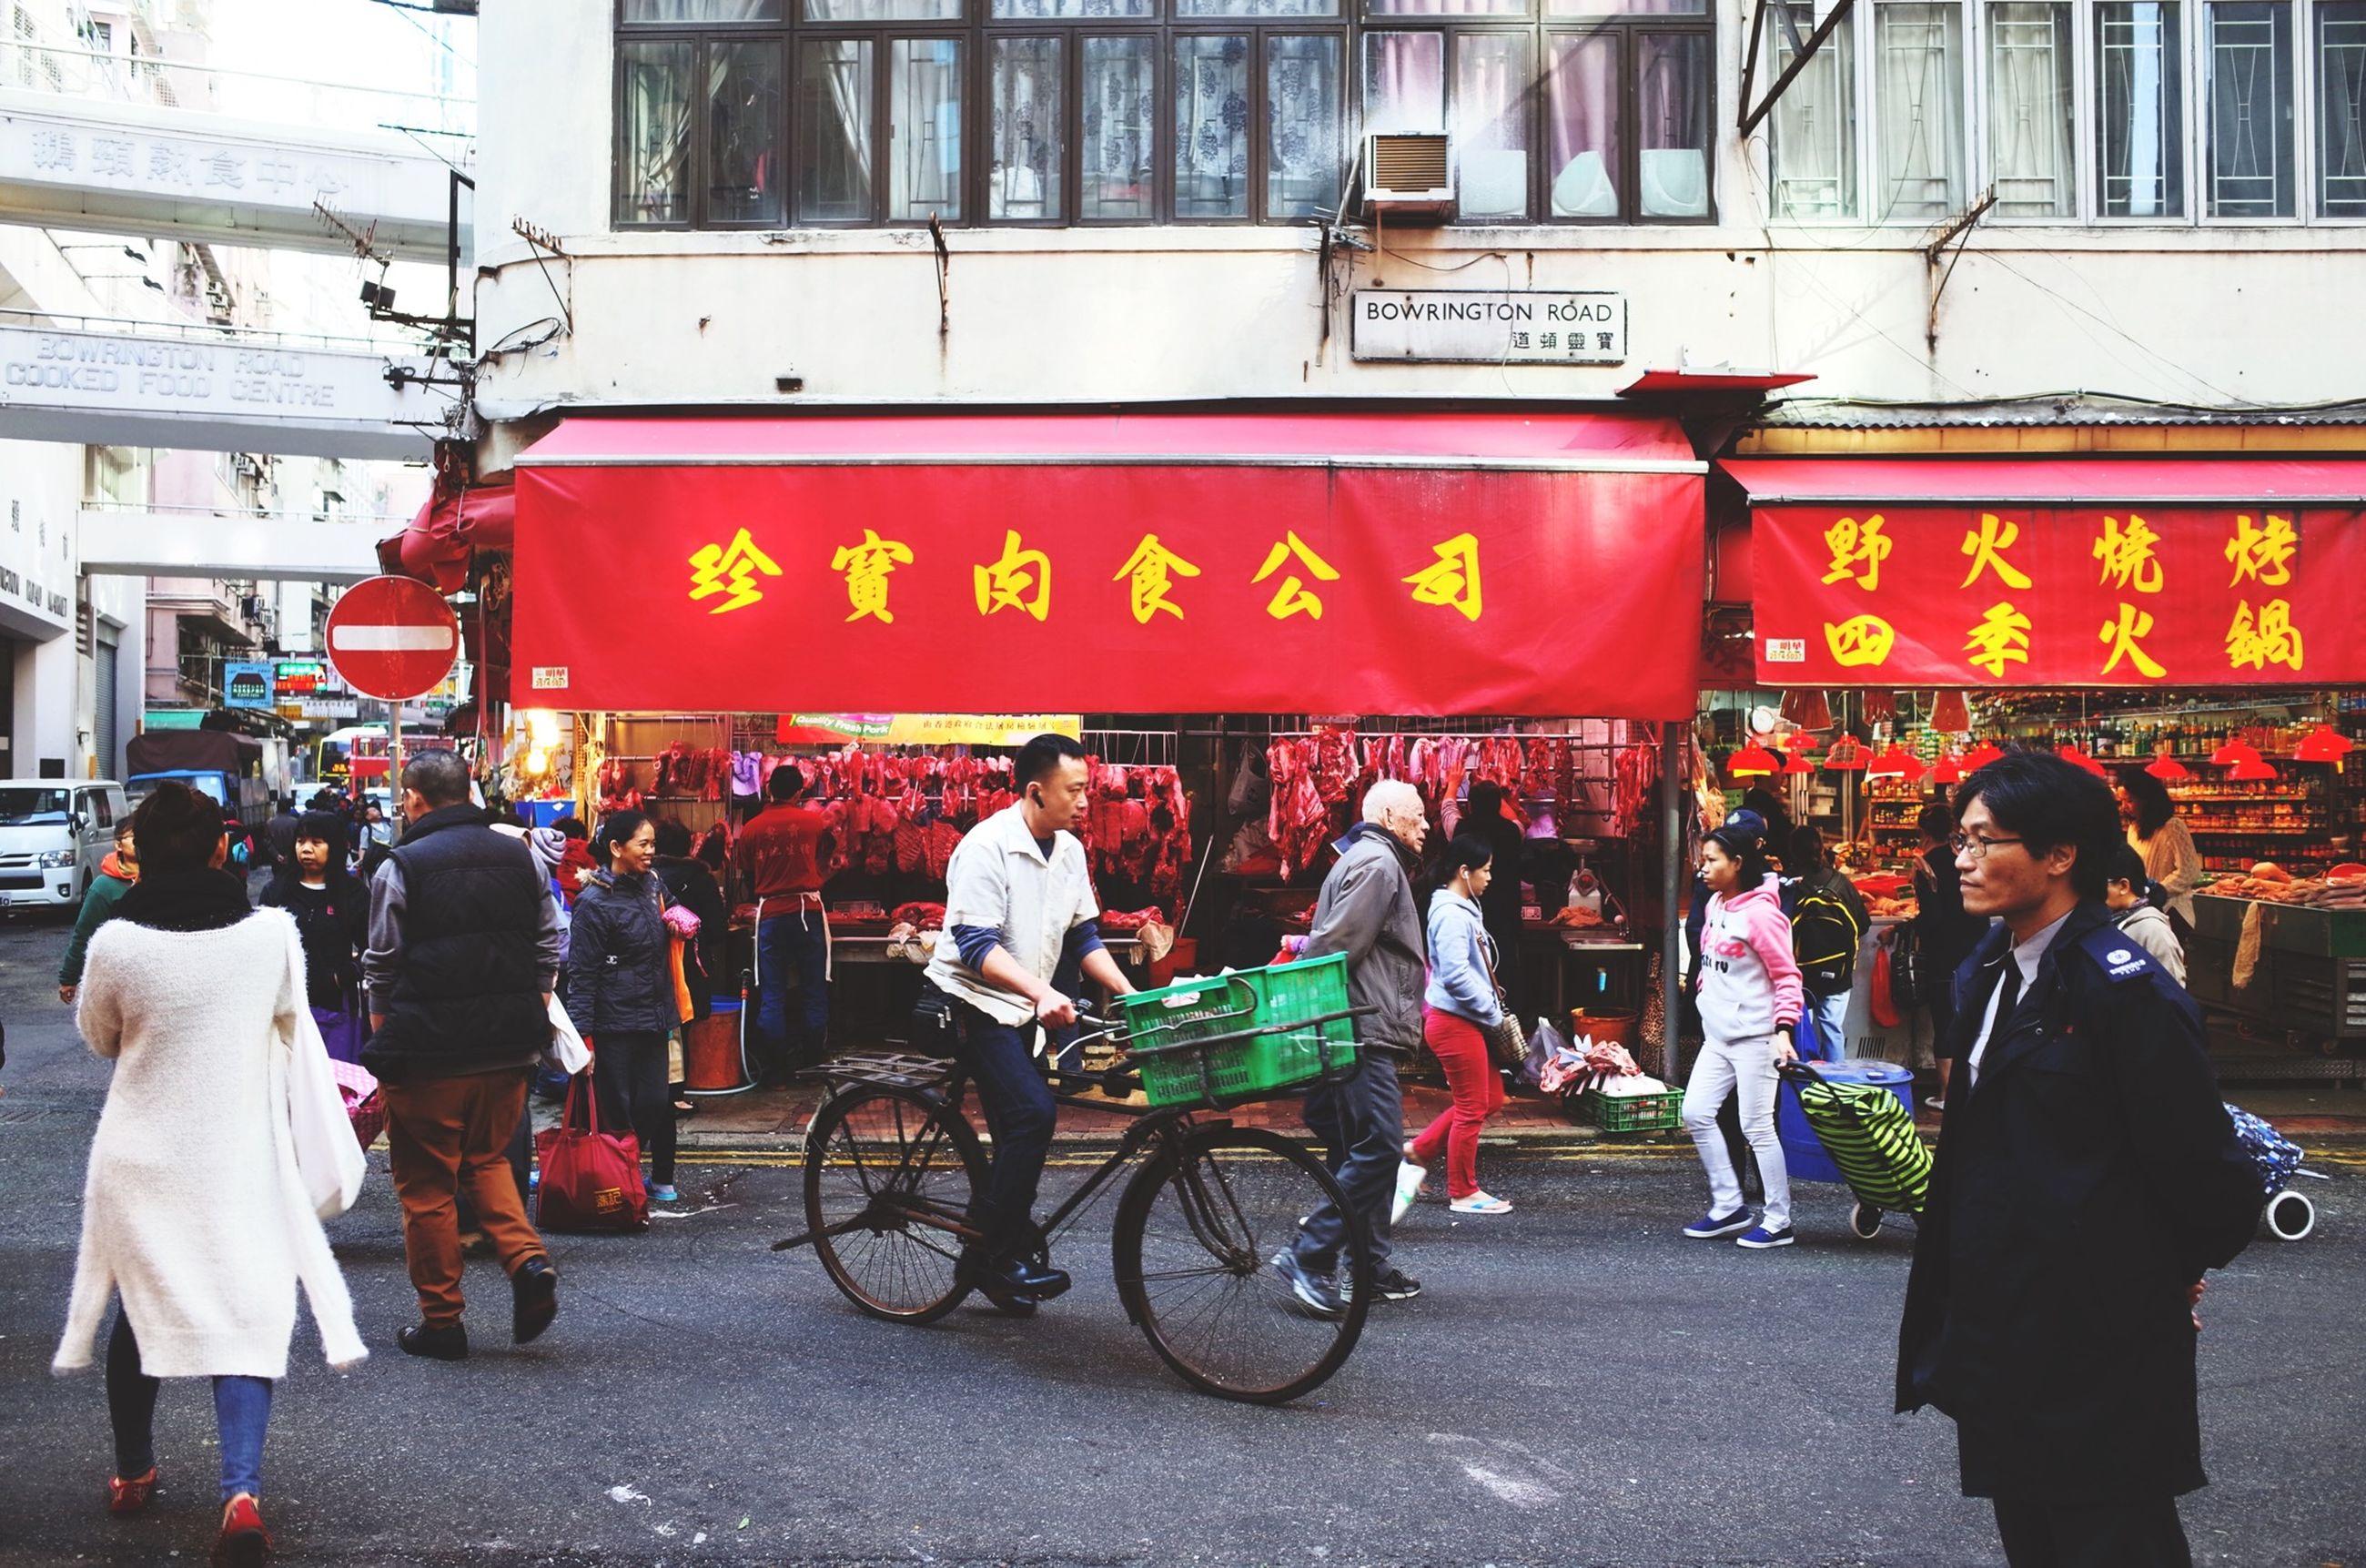 Street life, Bowrington Road Markets, Wan Chai, Hong Kong. Open Edit HongKong Streetphotography Travel Photography